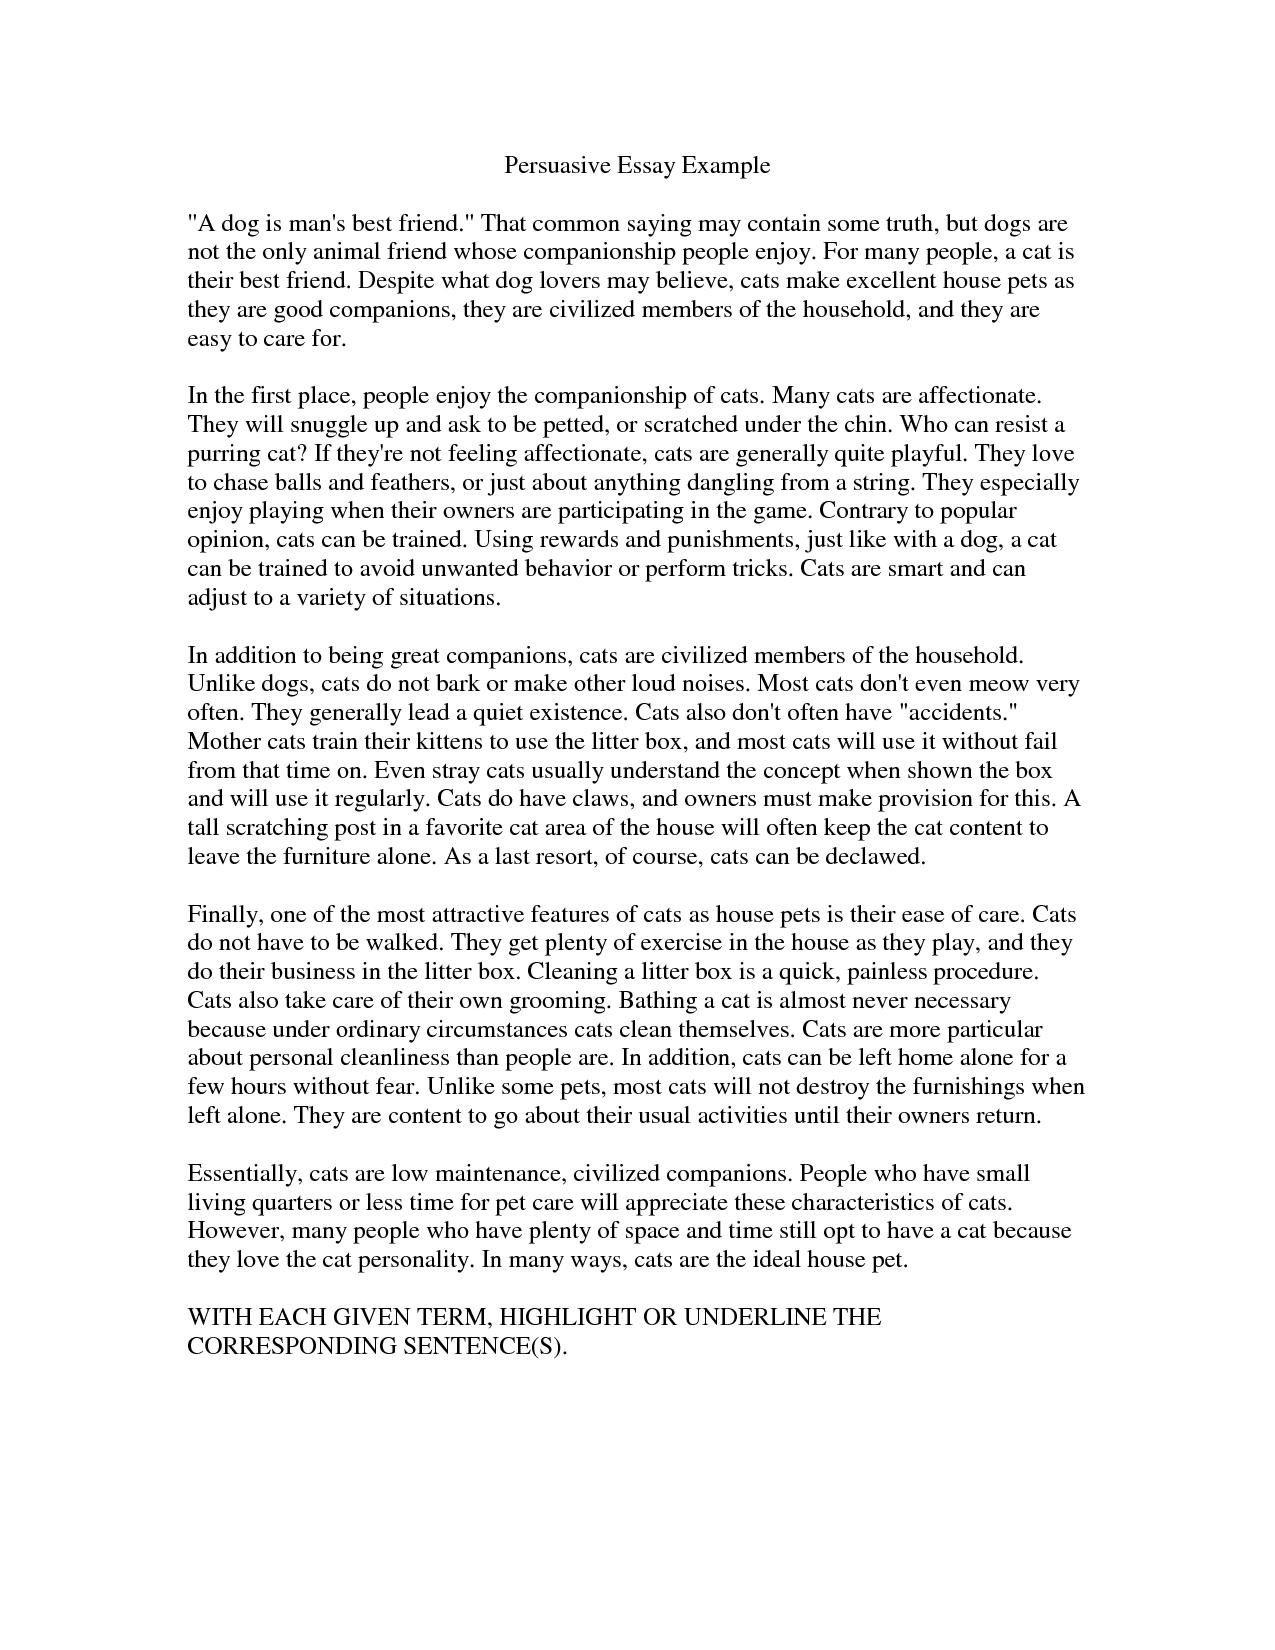 Persuasive argument essay sociology dissertation titles